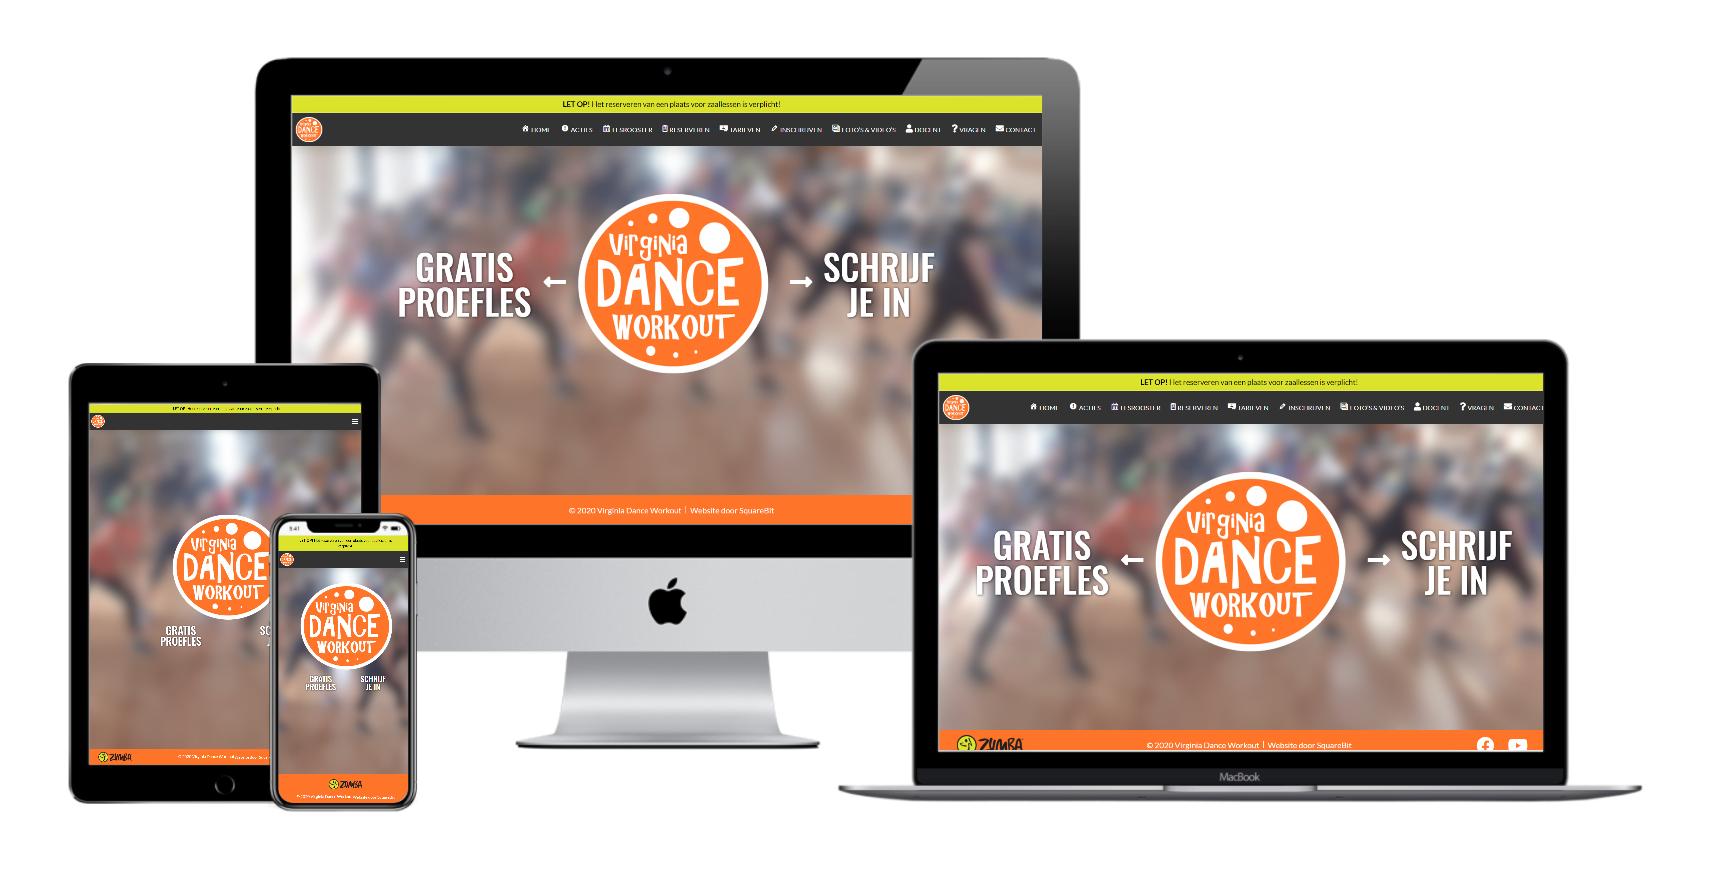 Virginia Dance Workout